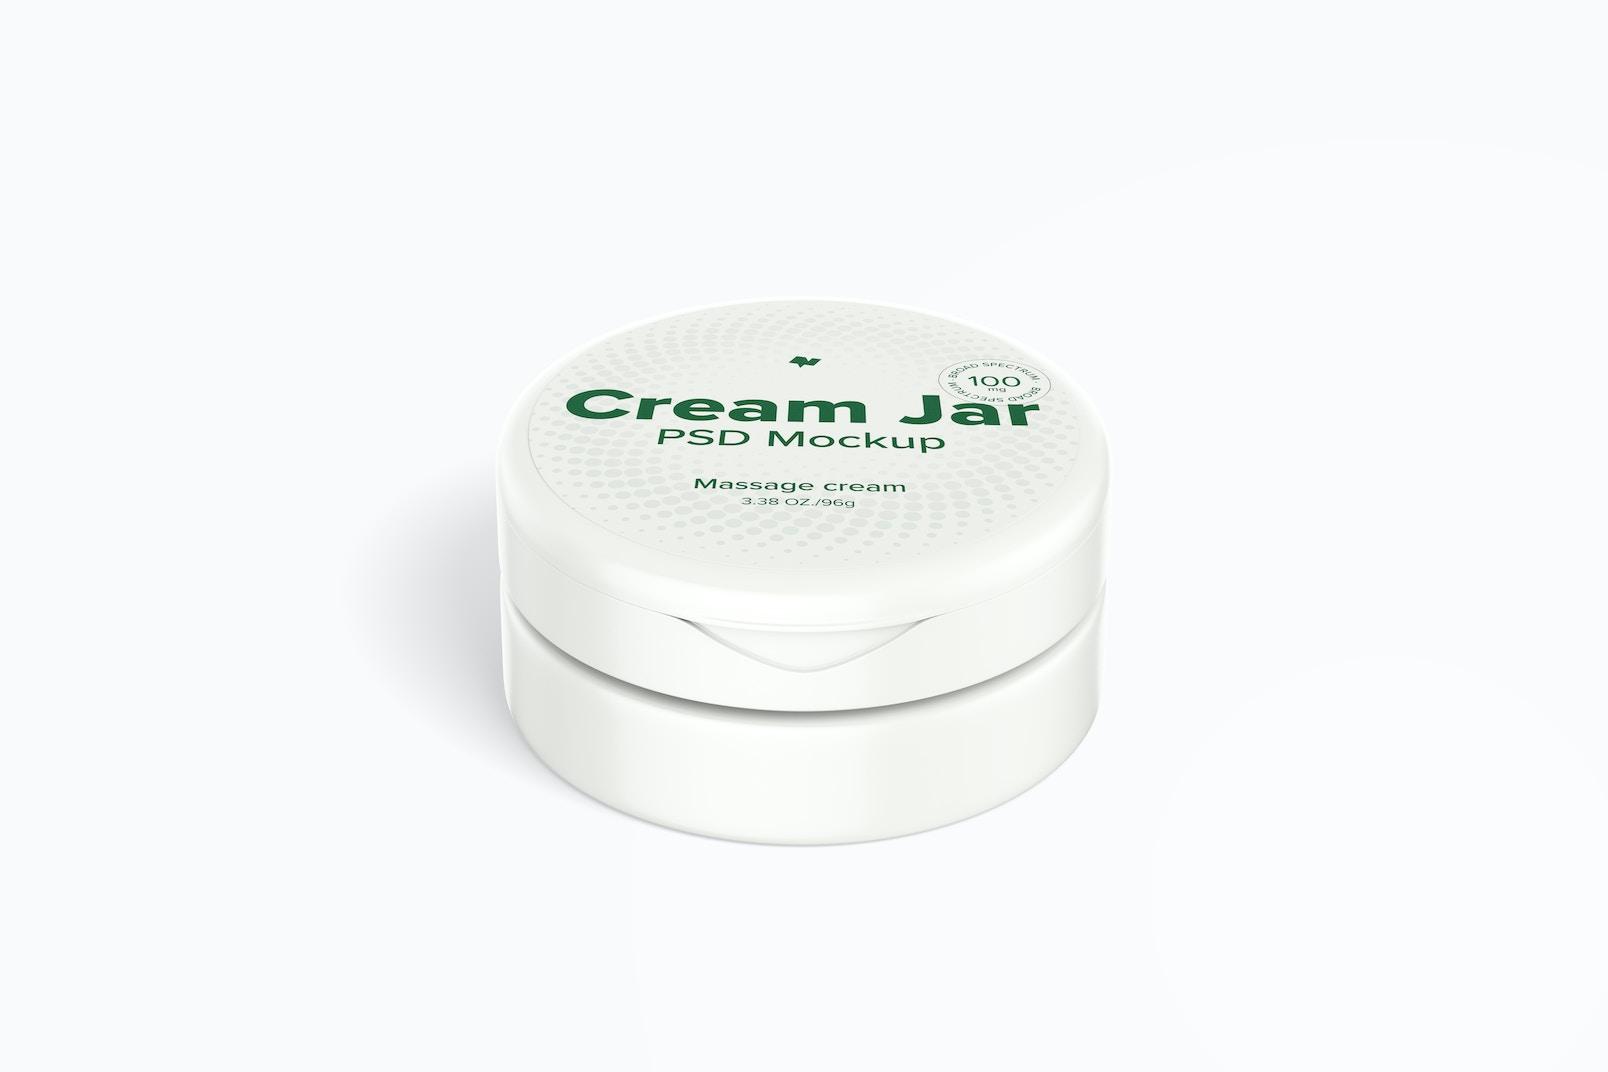 3.38 oz Cream Jar Mockup